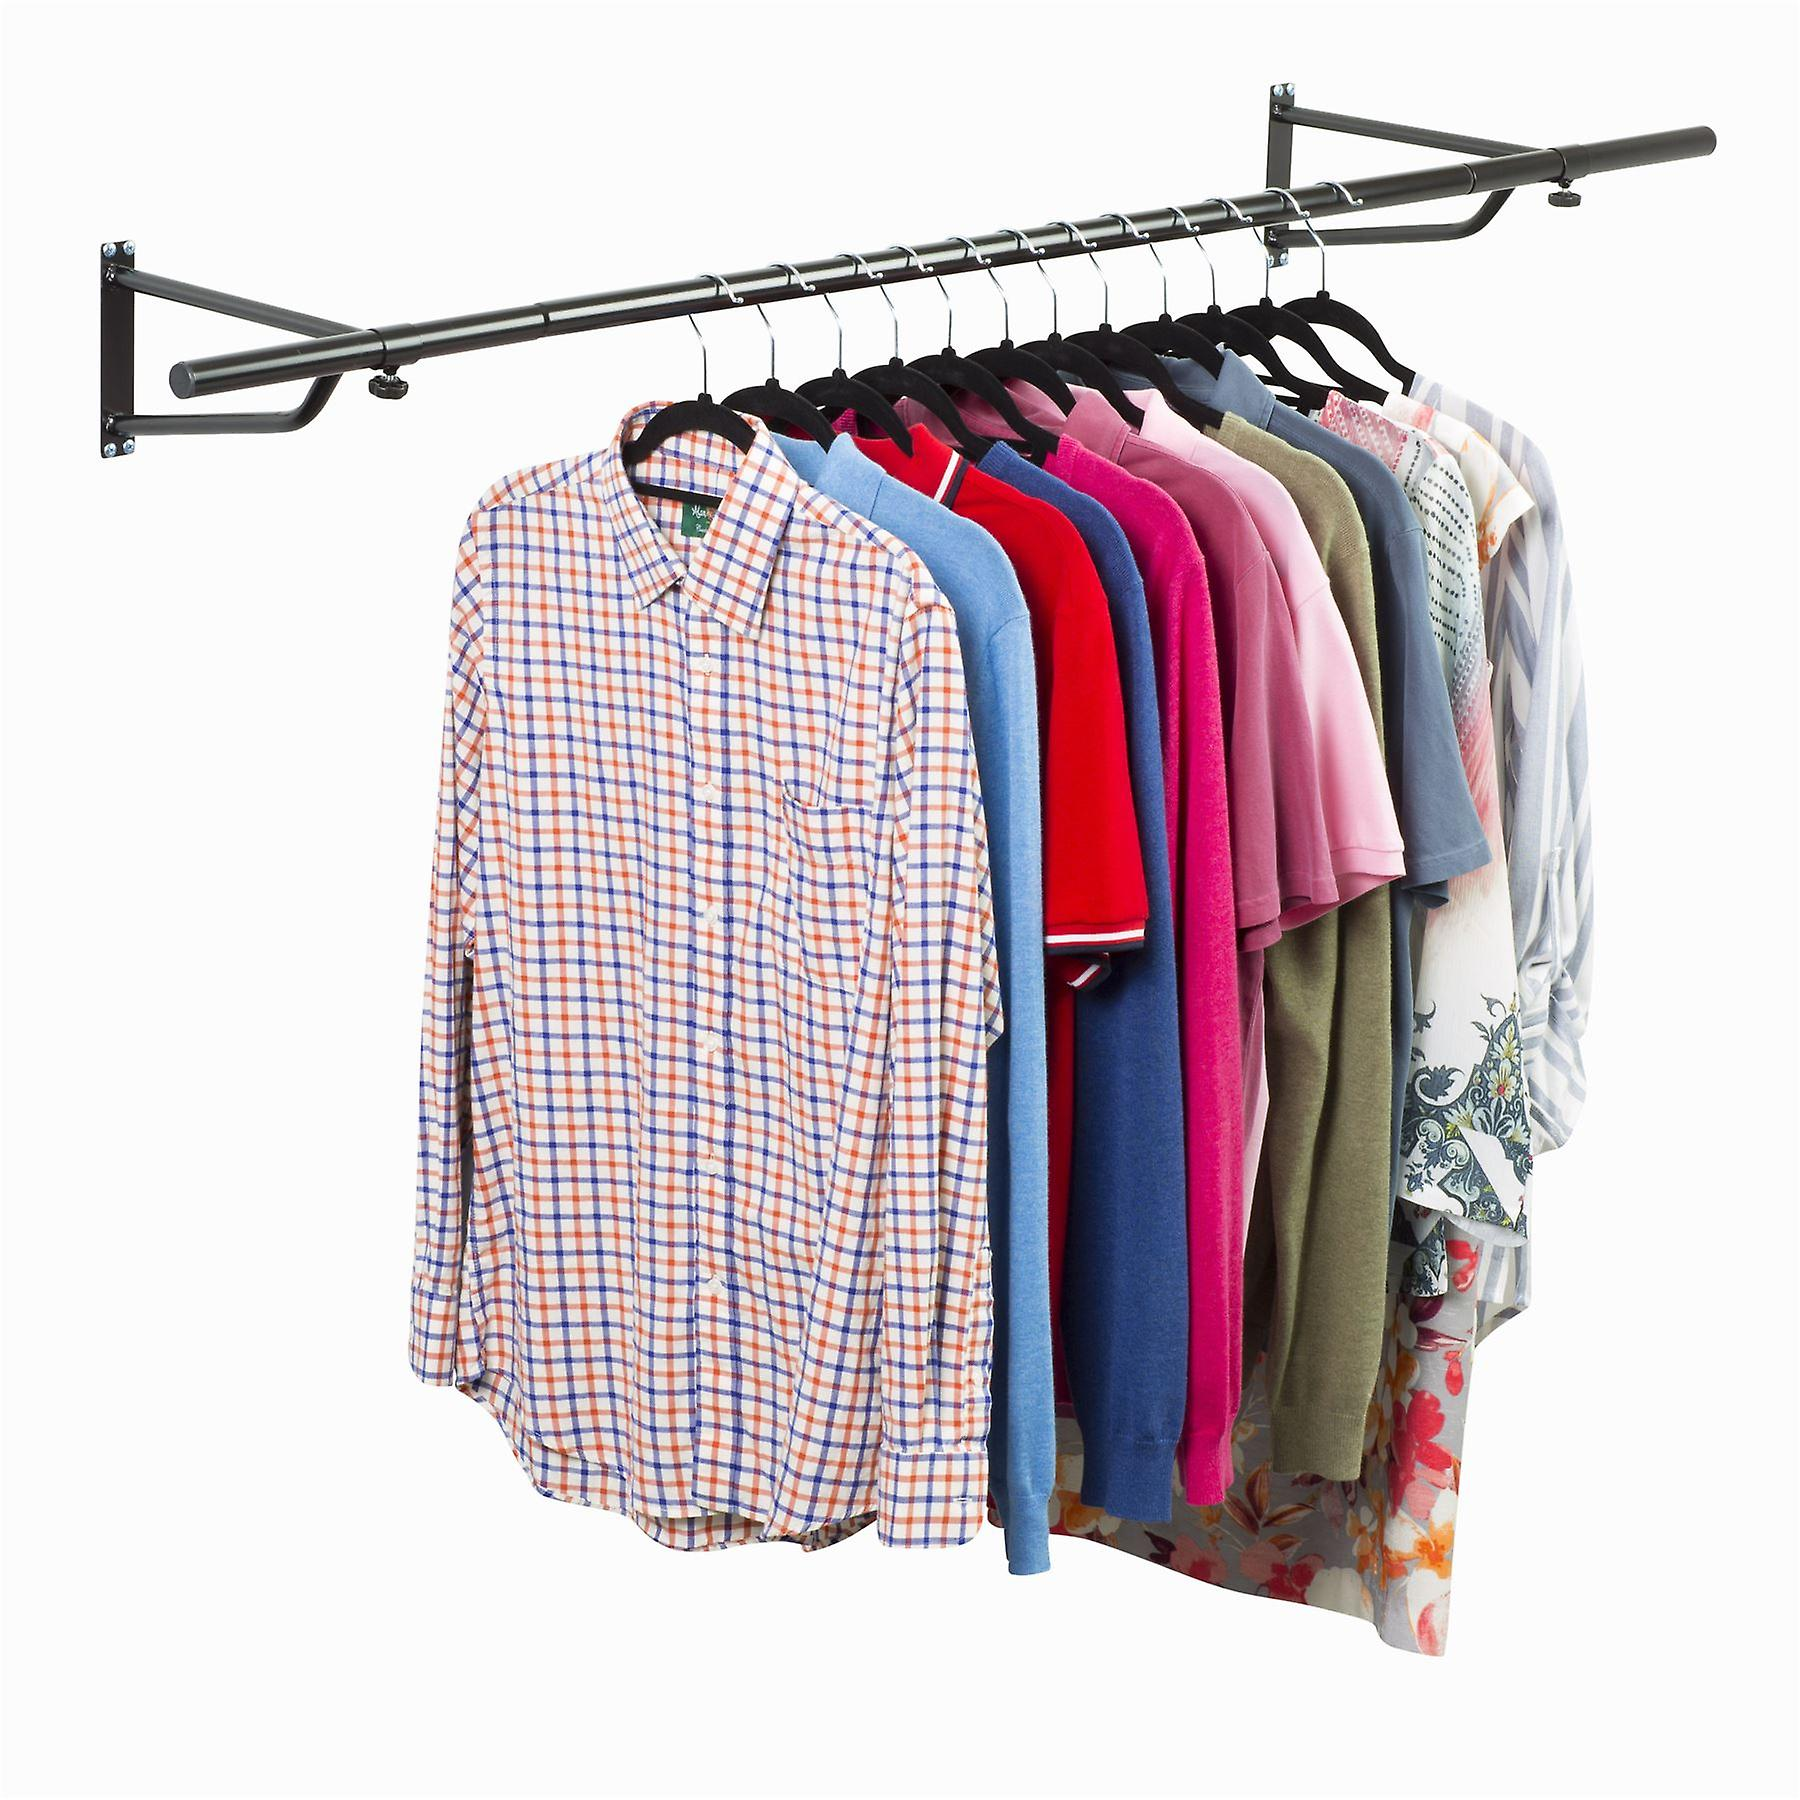 5ft Garment Rail In Black Powder Coating